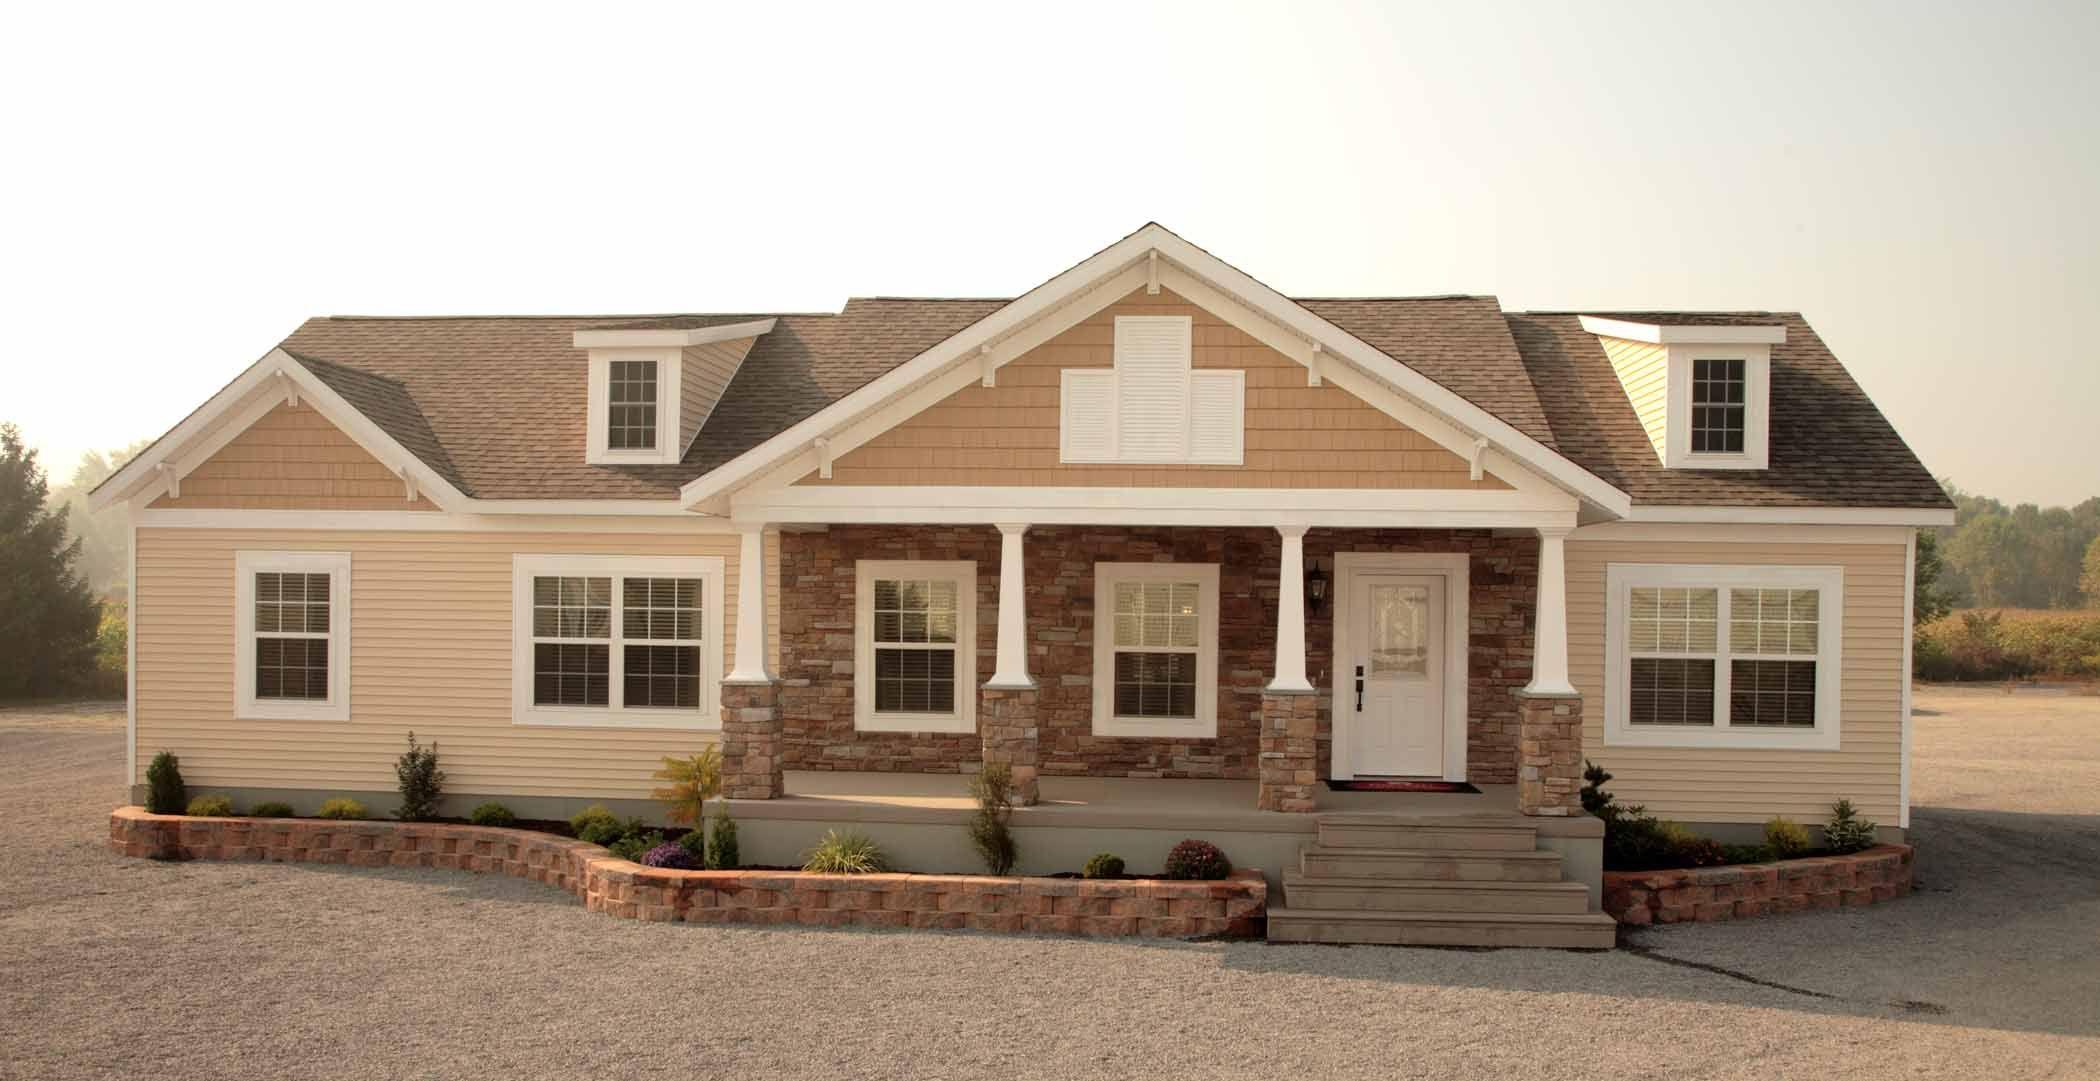 Manufactured Homes Inside Modular Interior Gallery Mobile Home Exteriors Manufactured Home Remodel Modular Home Plans